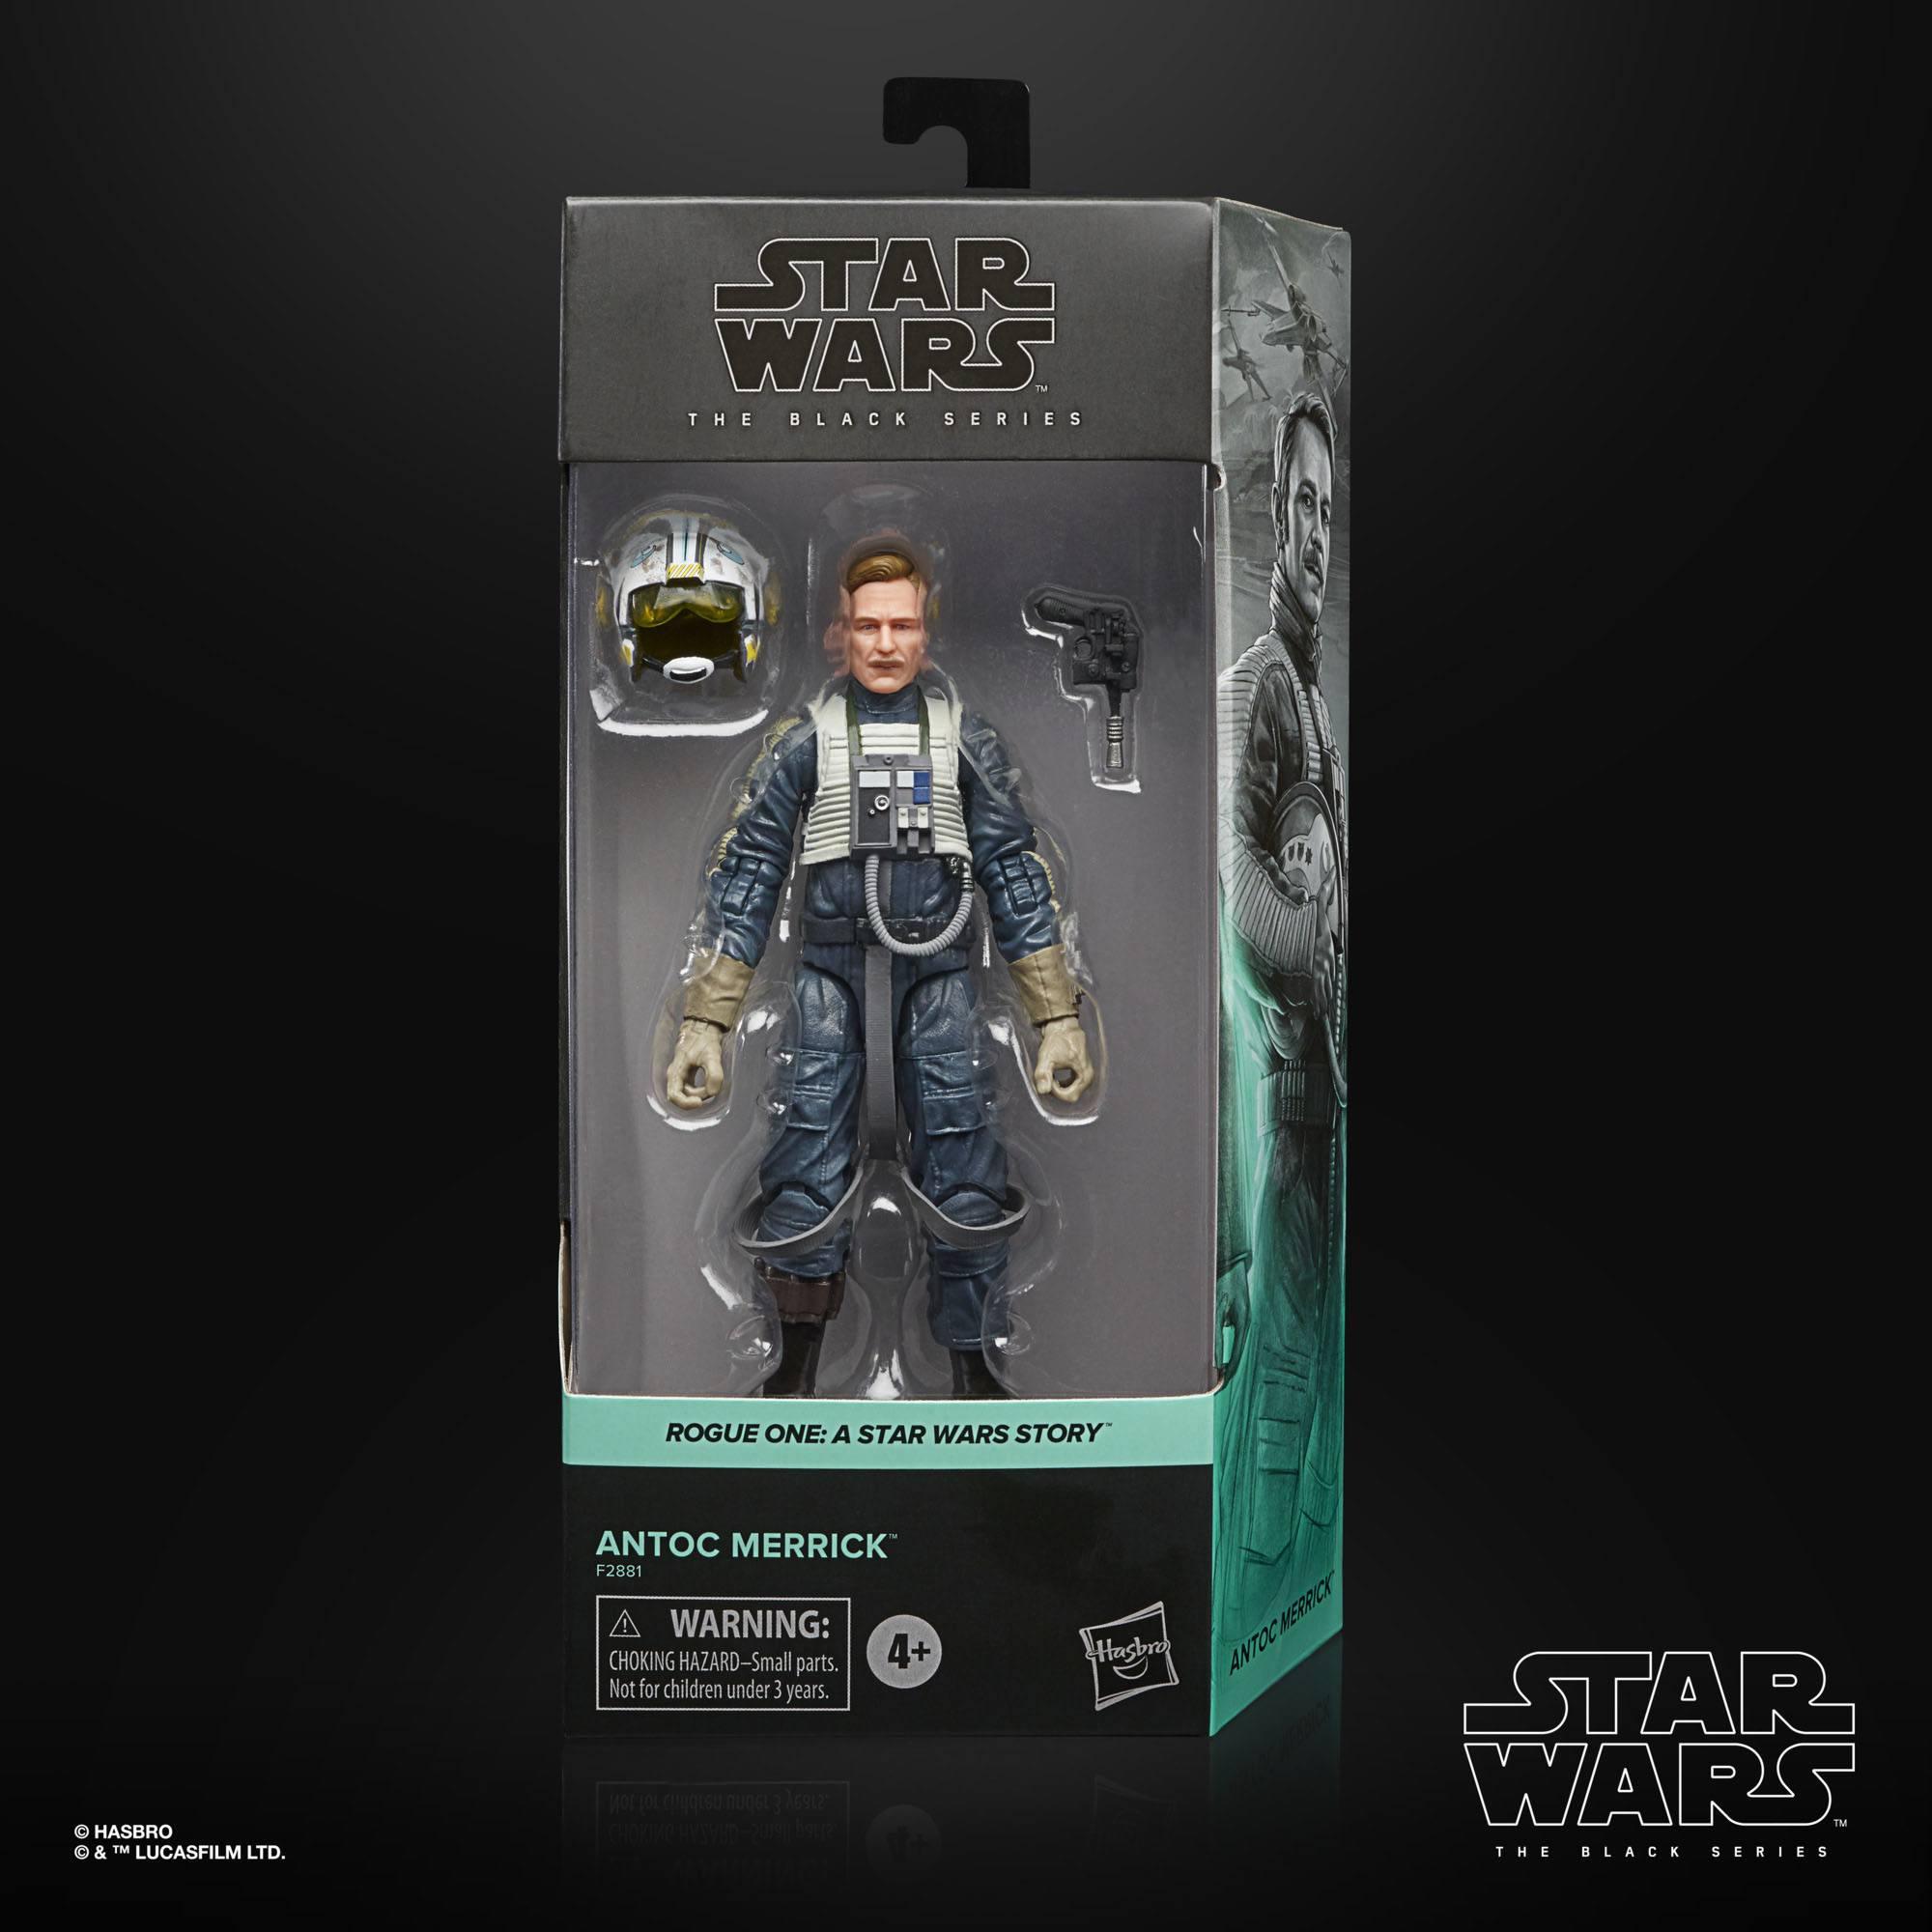 Star Wars The Black Series Antoc Merrick Target Exclusive F28815L0 5010993904990